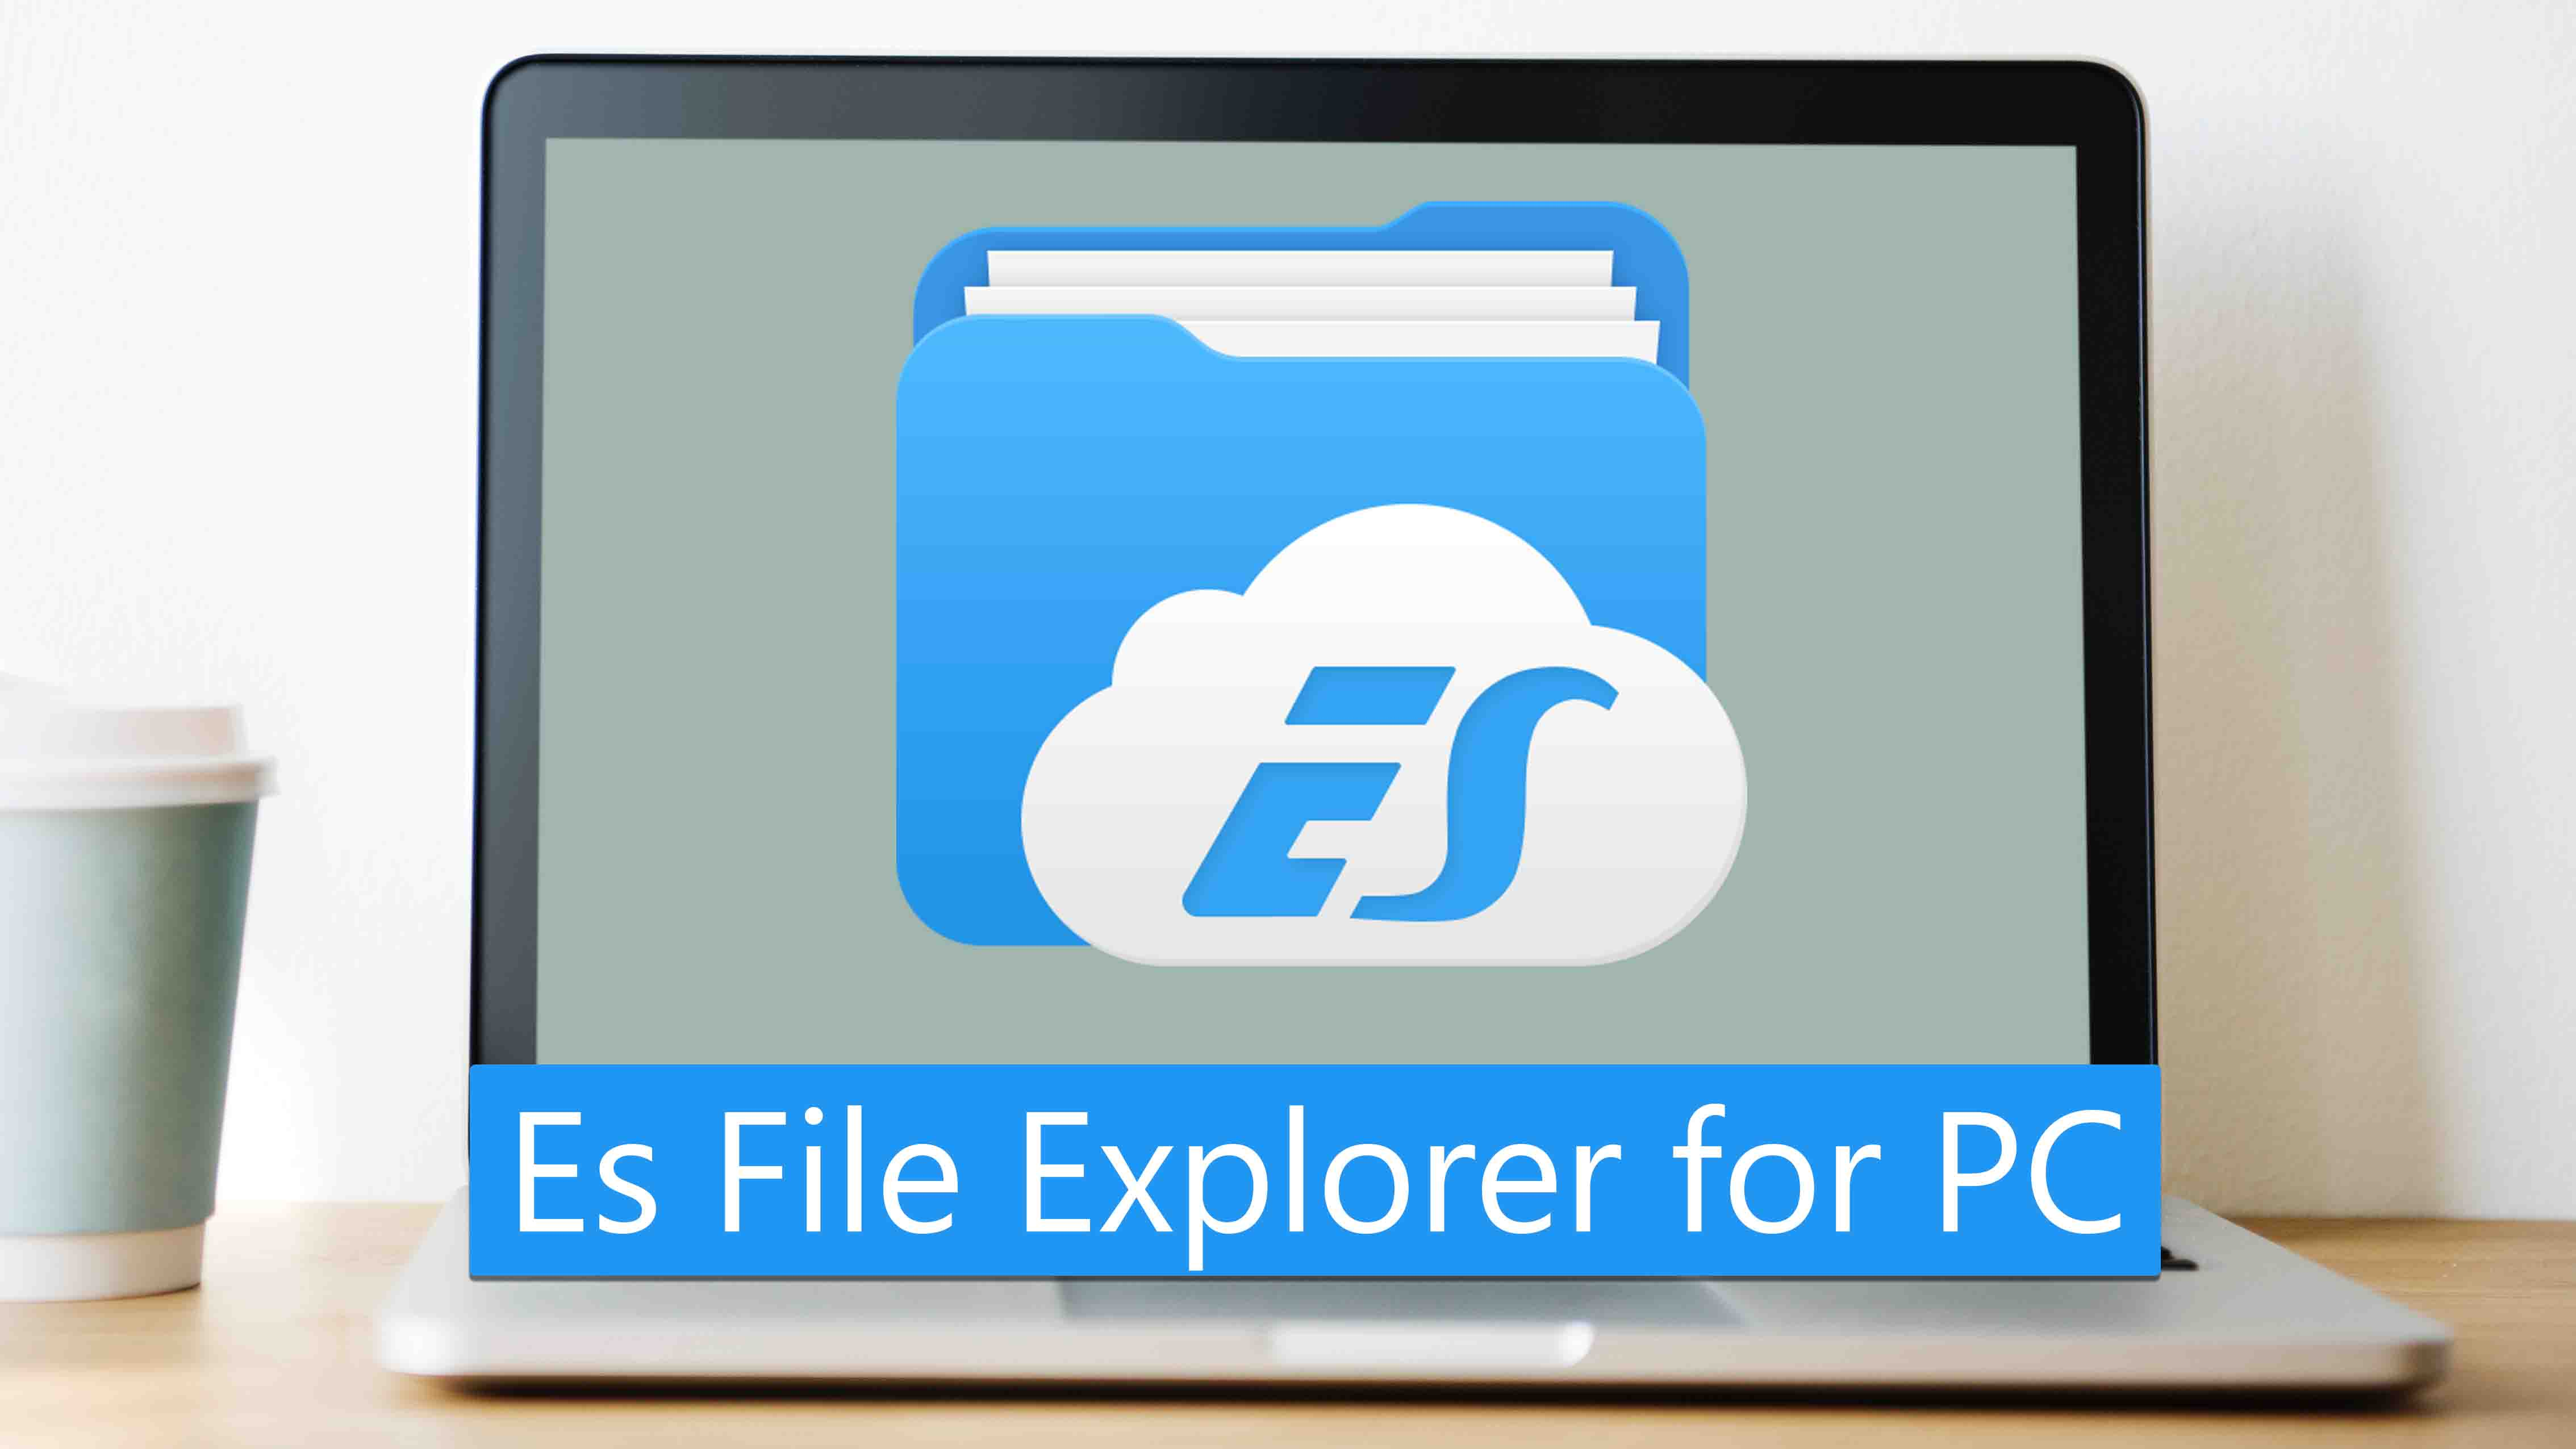 es file explorer apk for pc download